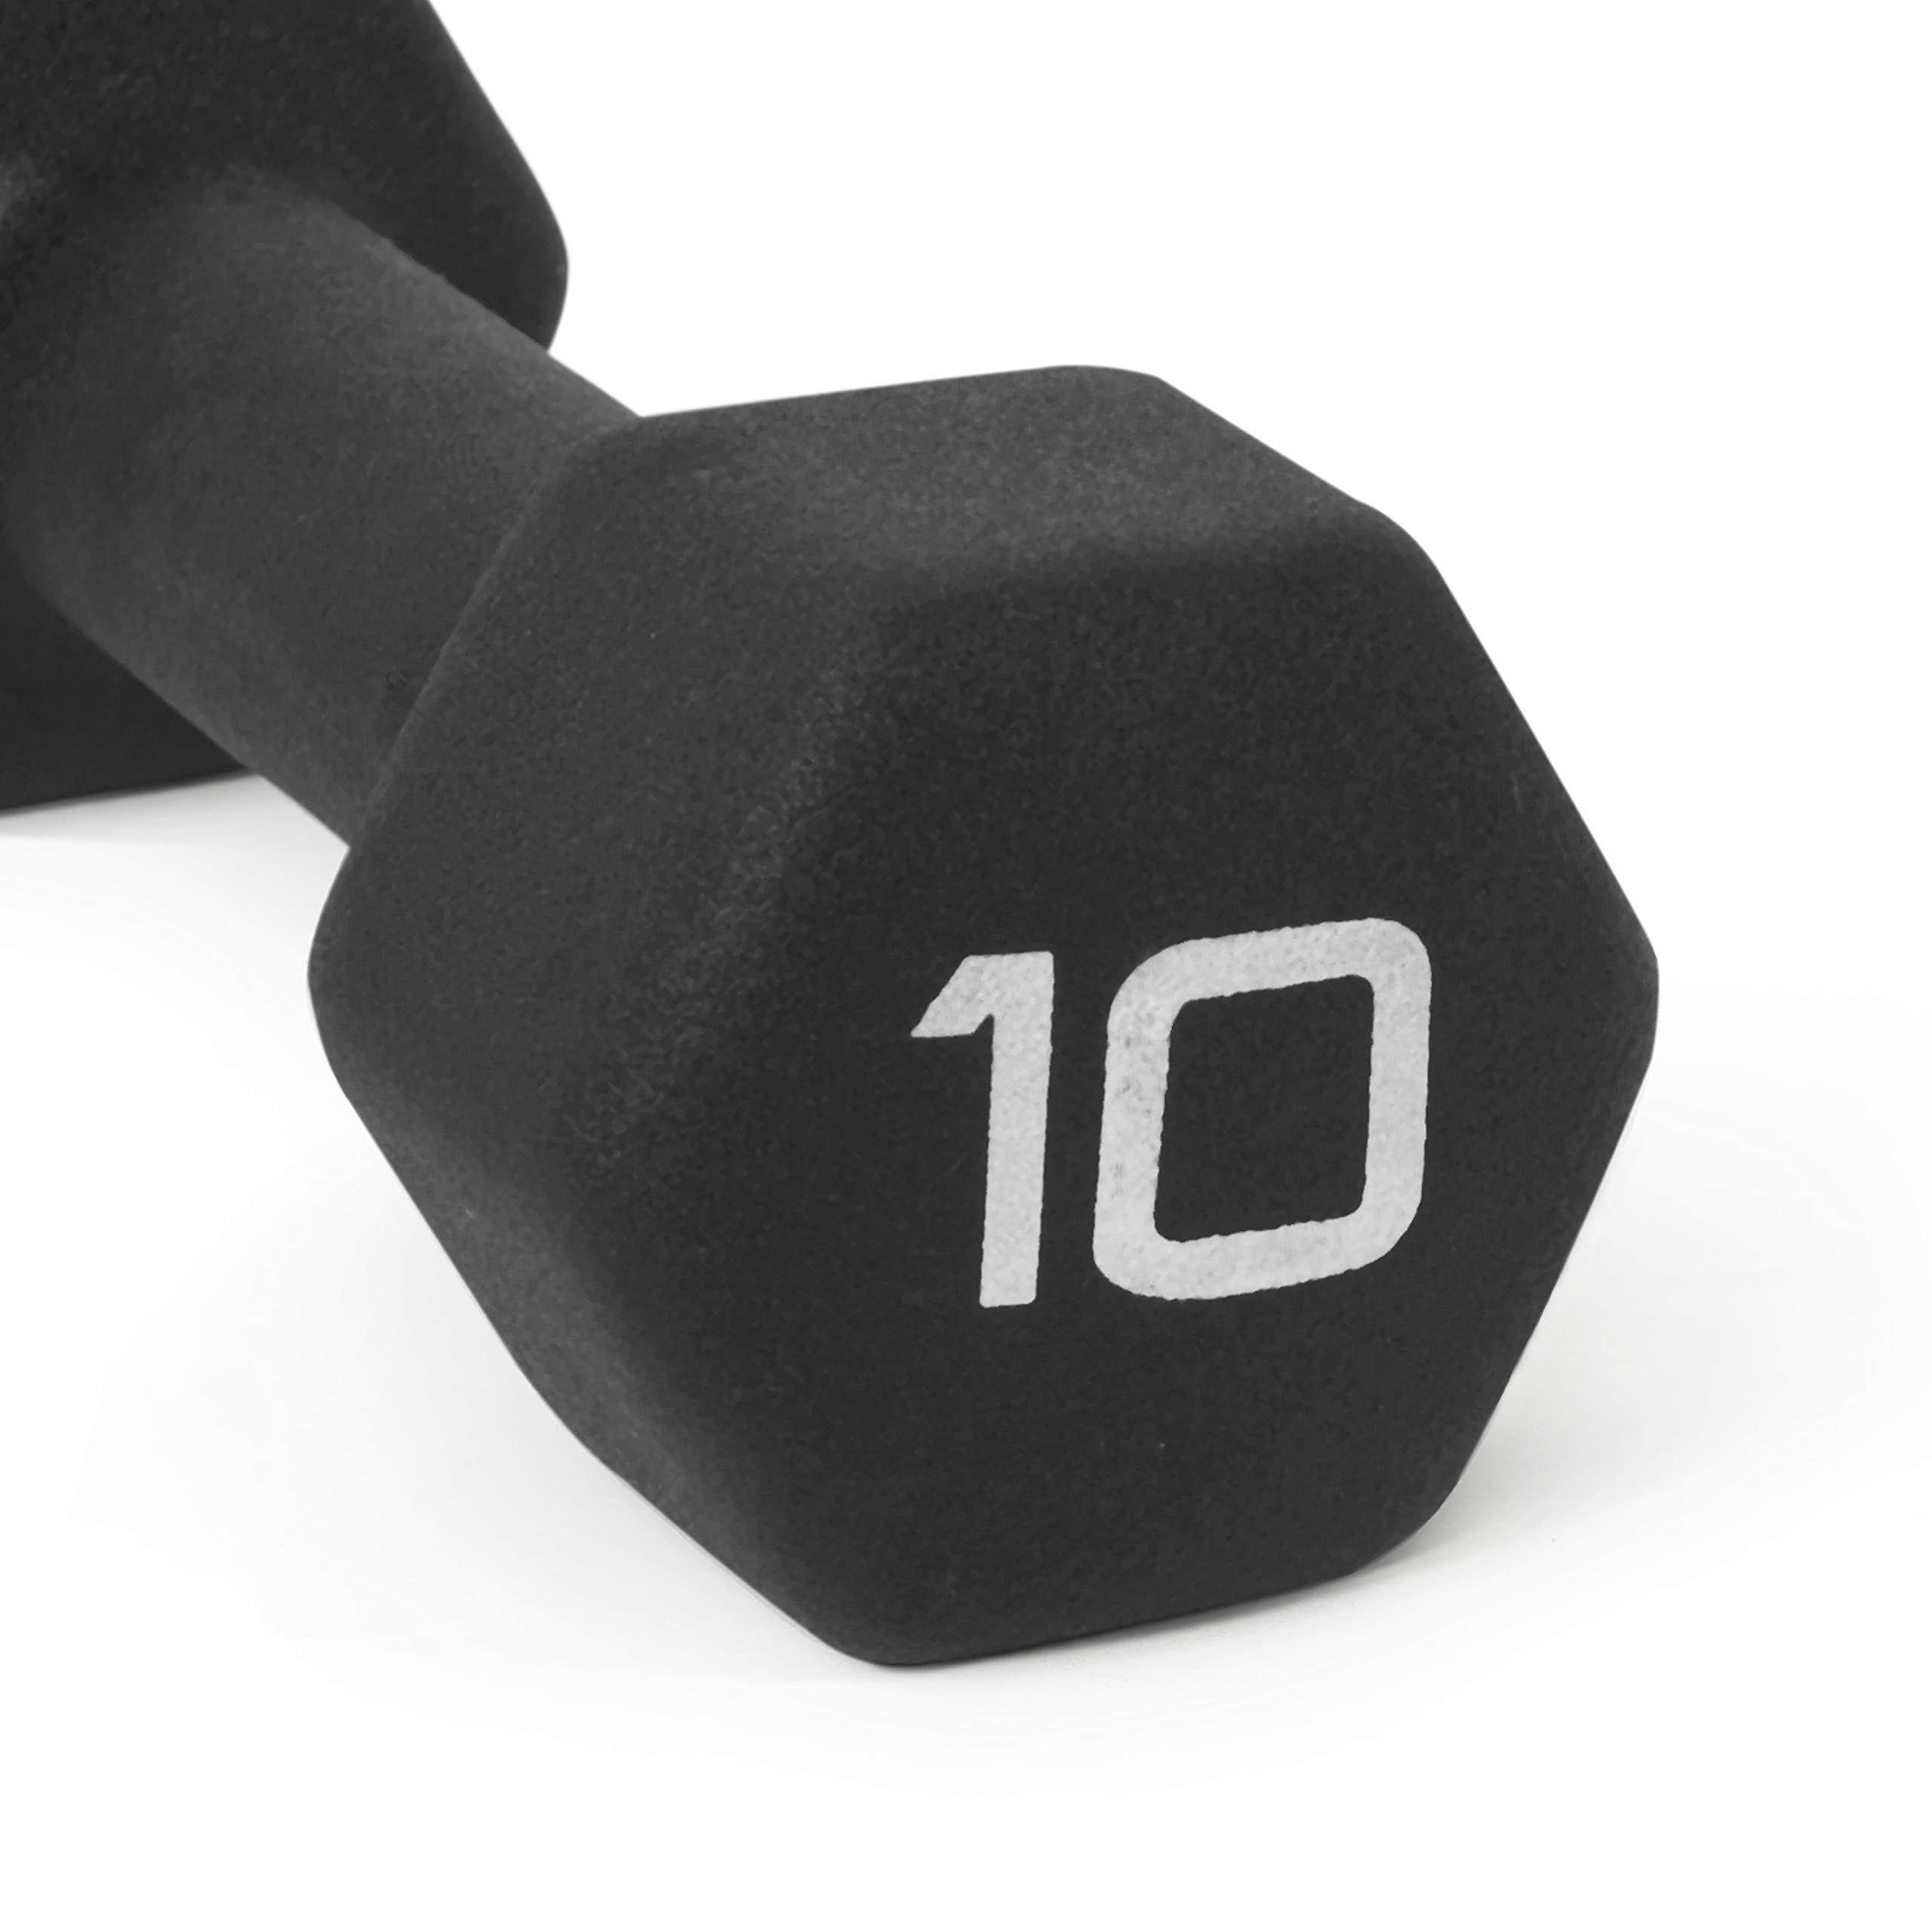 CAP Barbell Neoprene Coated Single Dumbbell, Black, 10-Pound by CAP Barbell (Image #5)